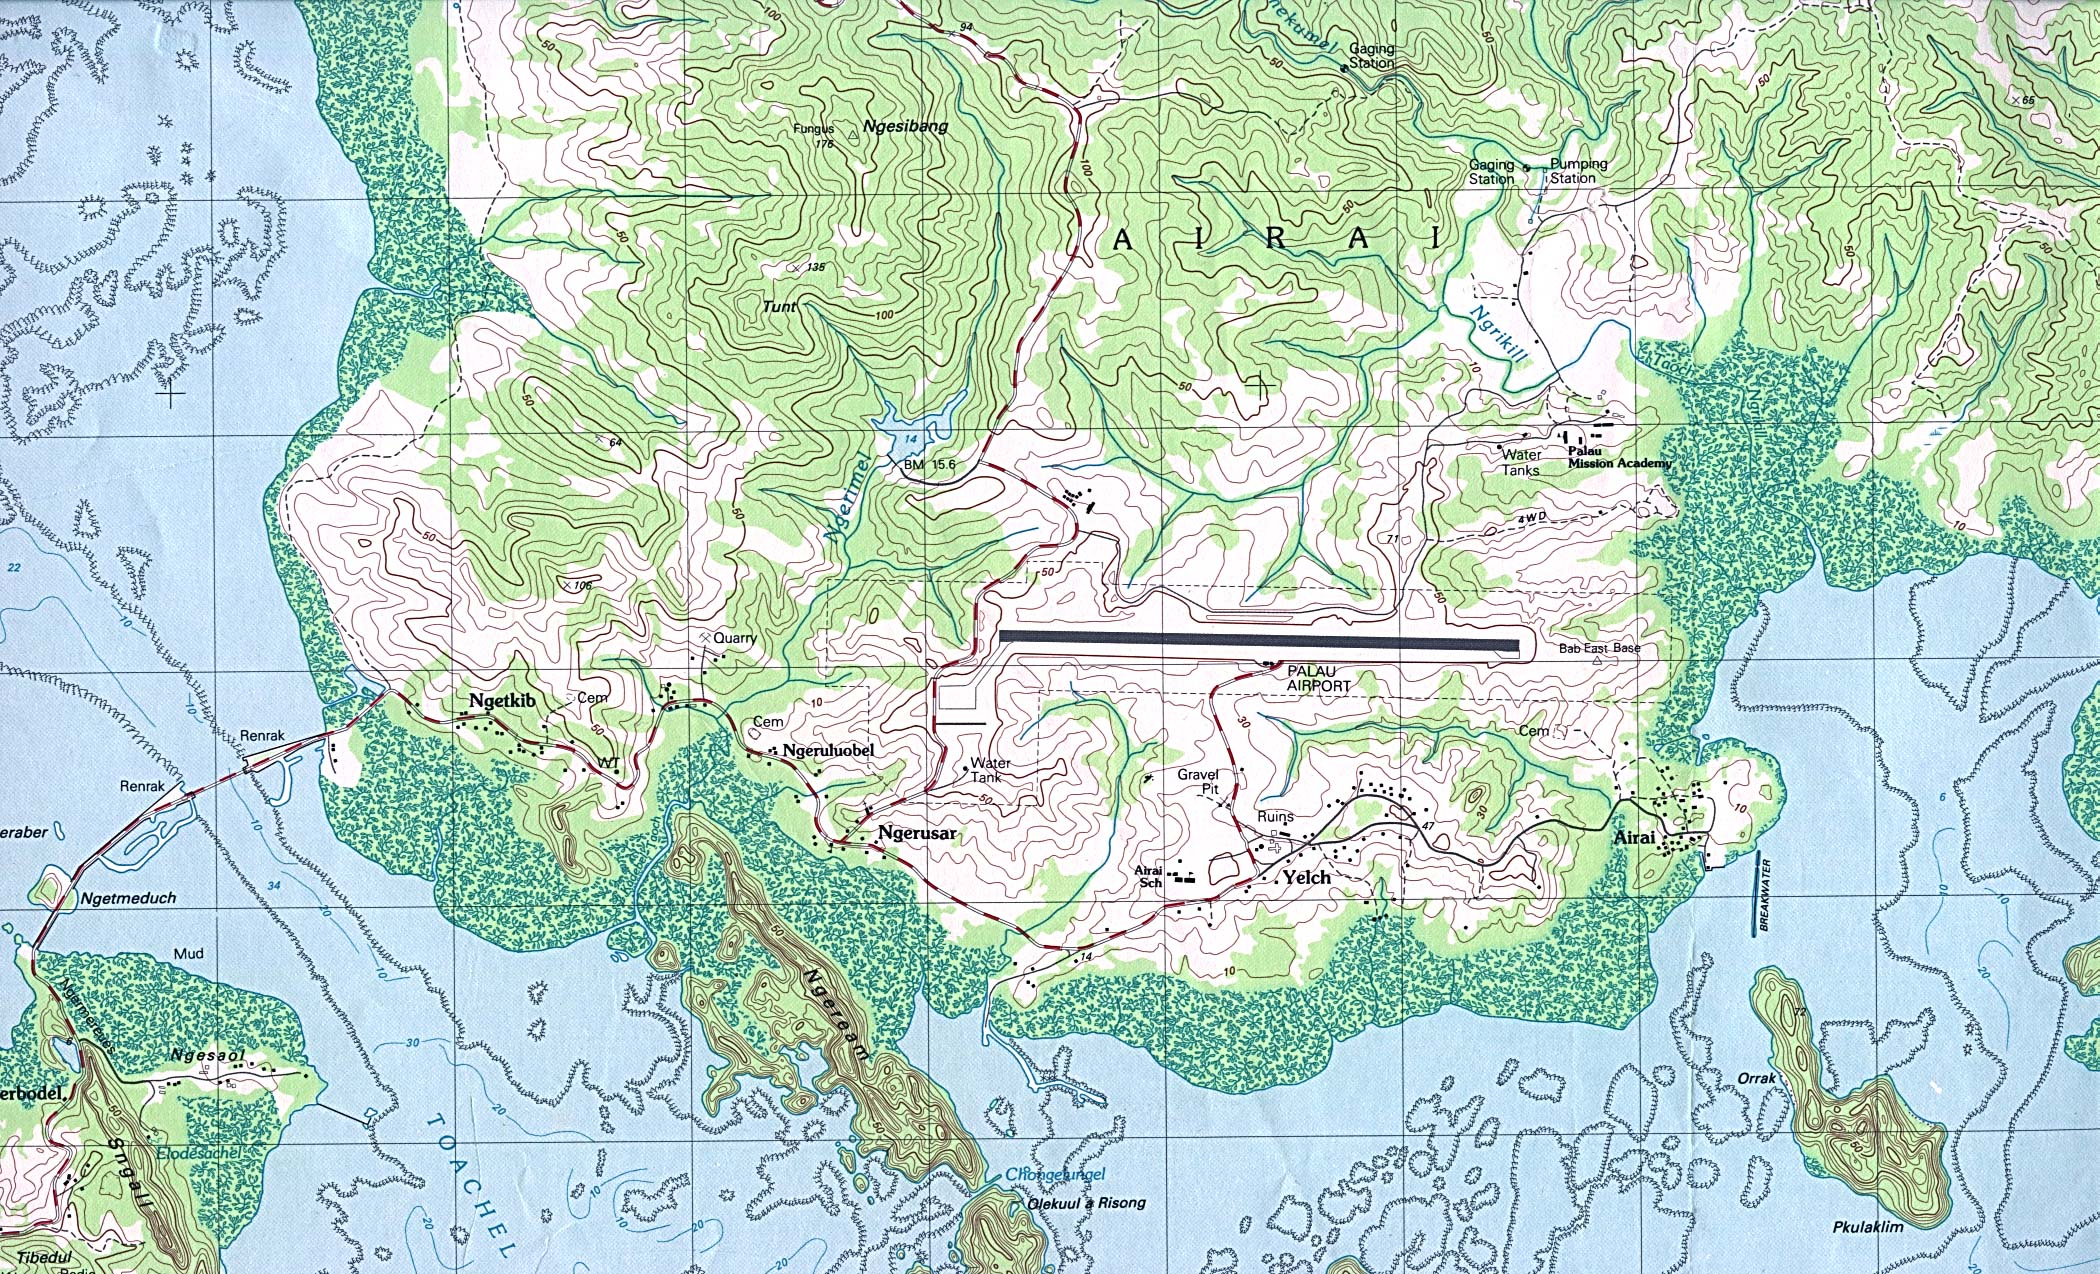 Reisenett Palau Maps - Palau map